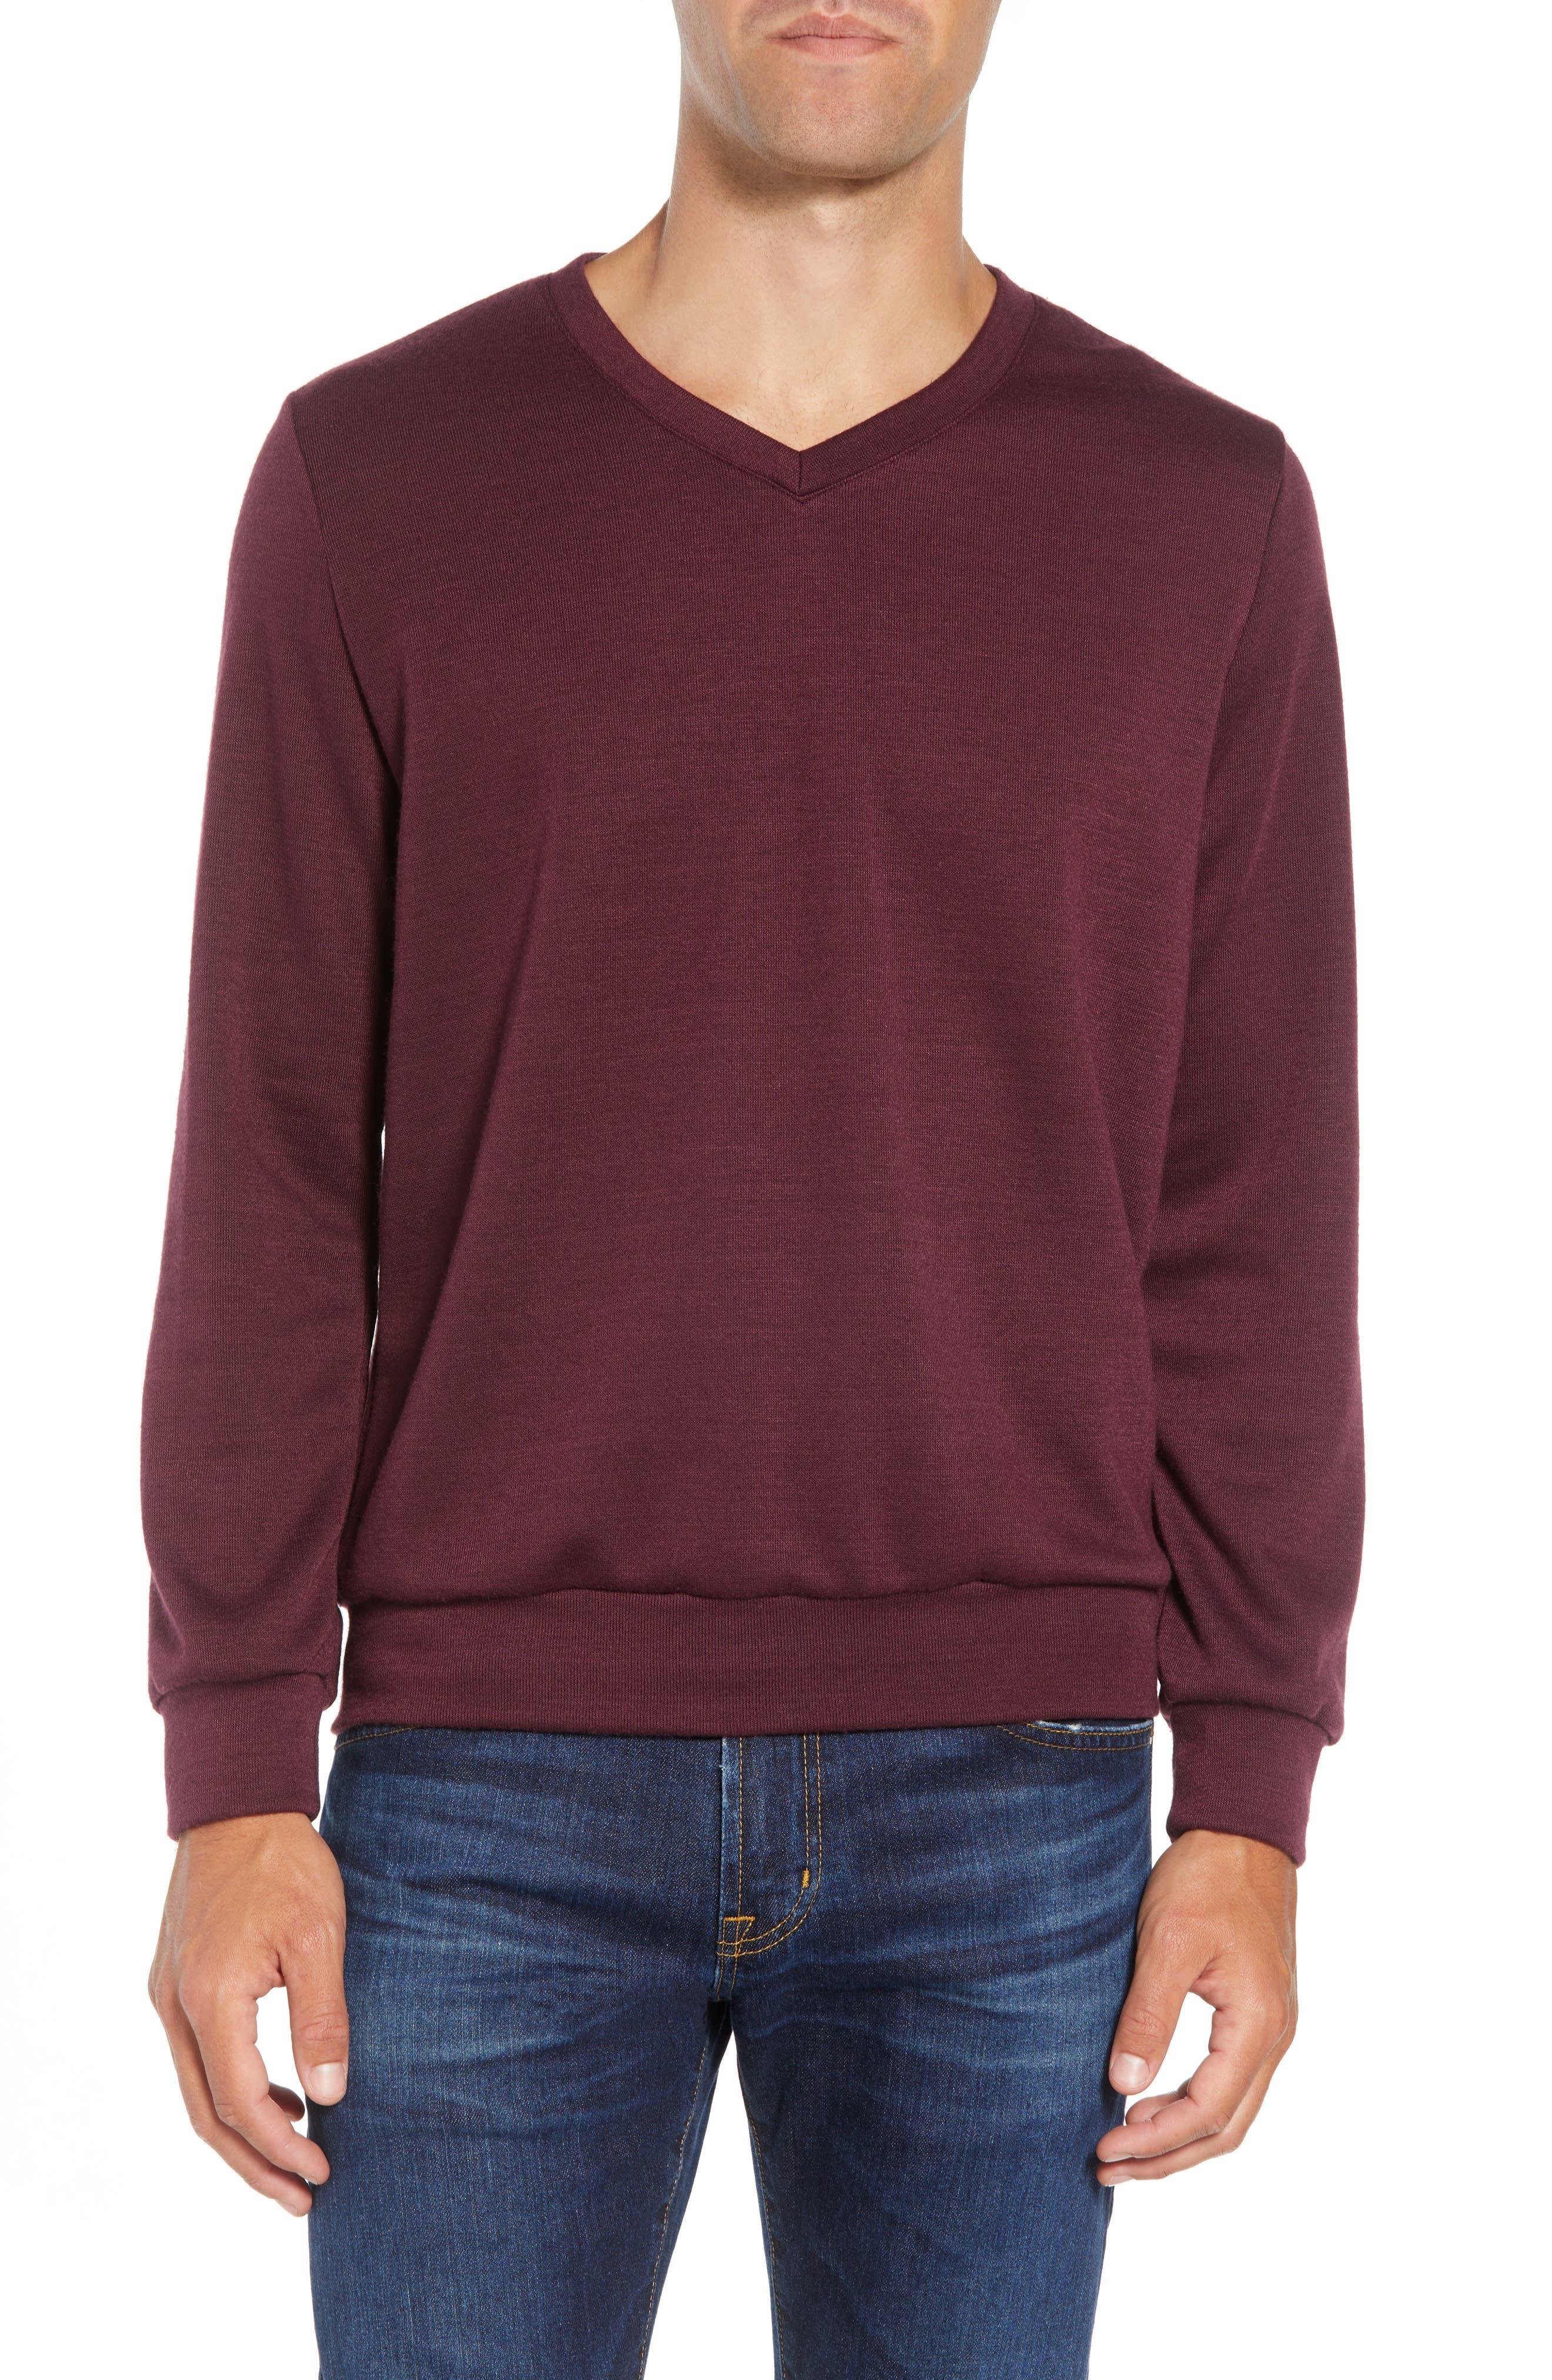 Pomerelle V-Neck Performance Sweater,                             Main thumbnail 1, color,                             MERLOT